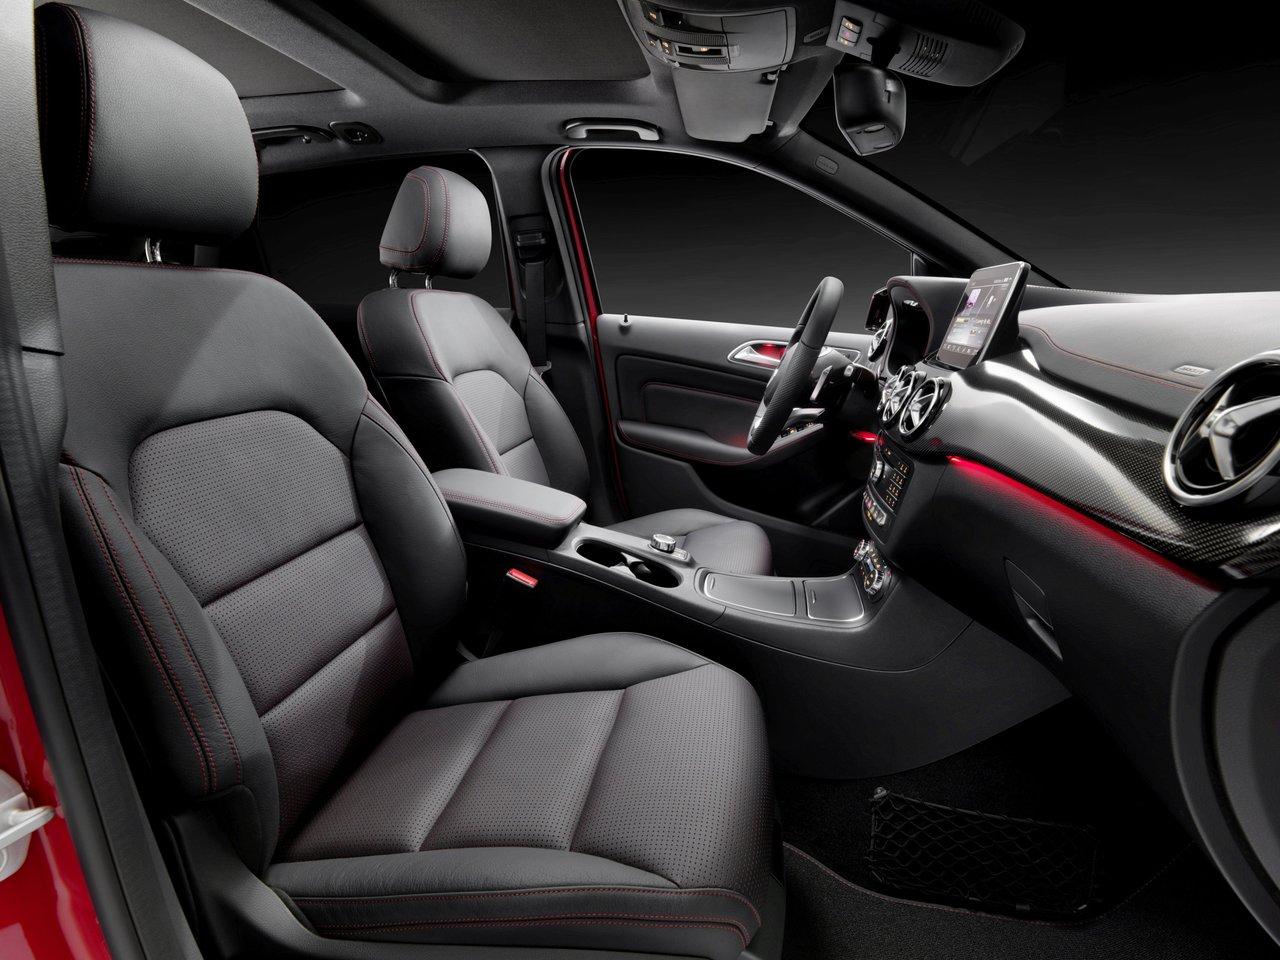 Снимки: Mercedes-benz B-klasse (W246)